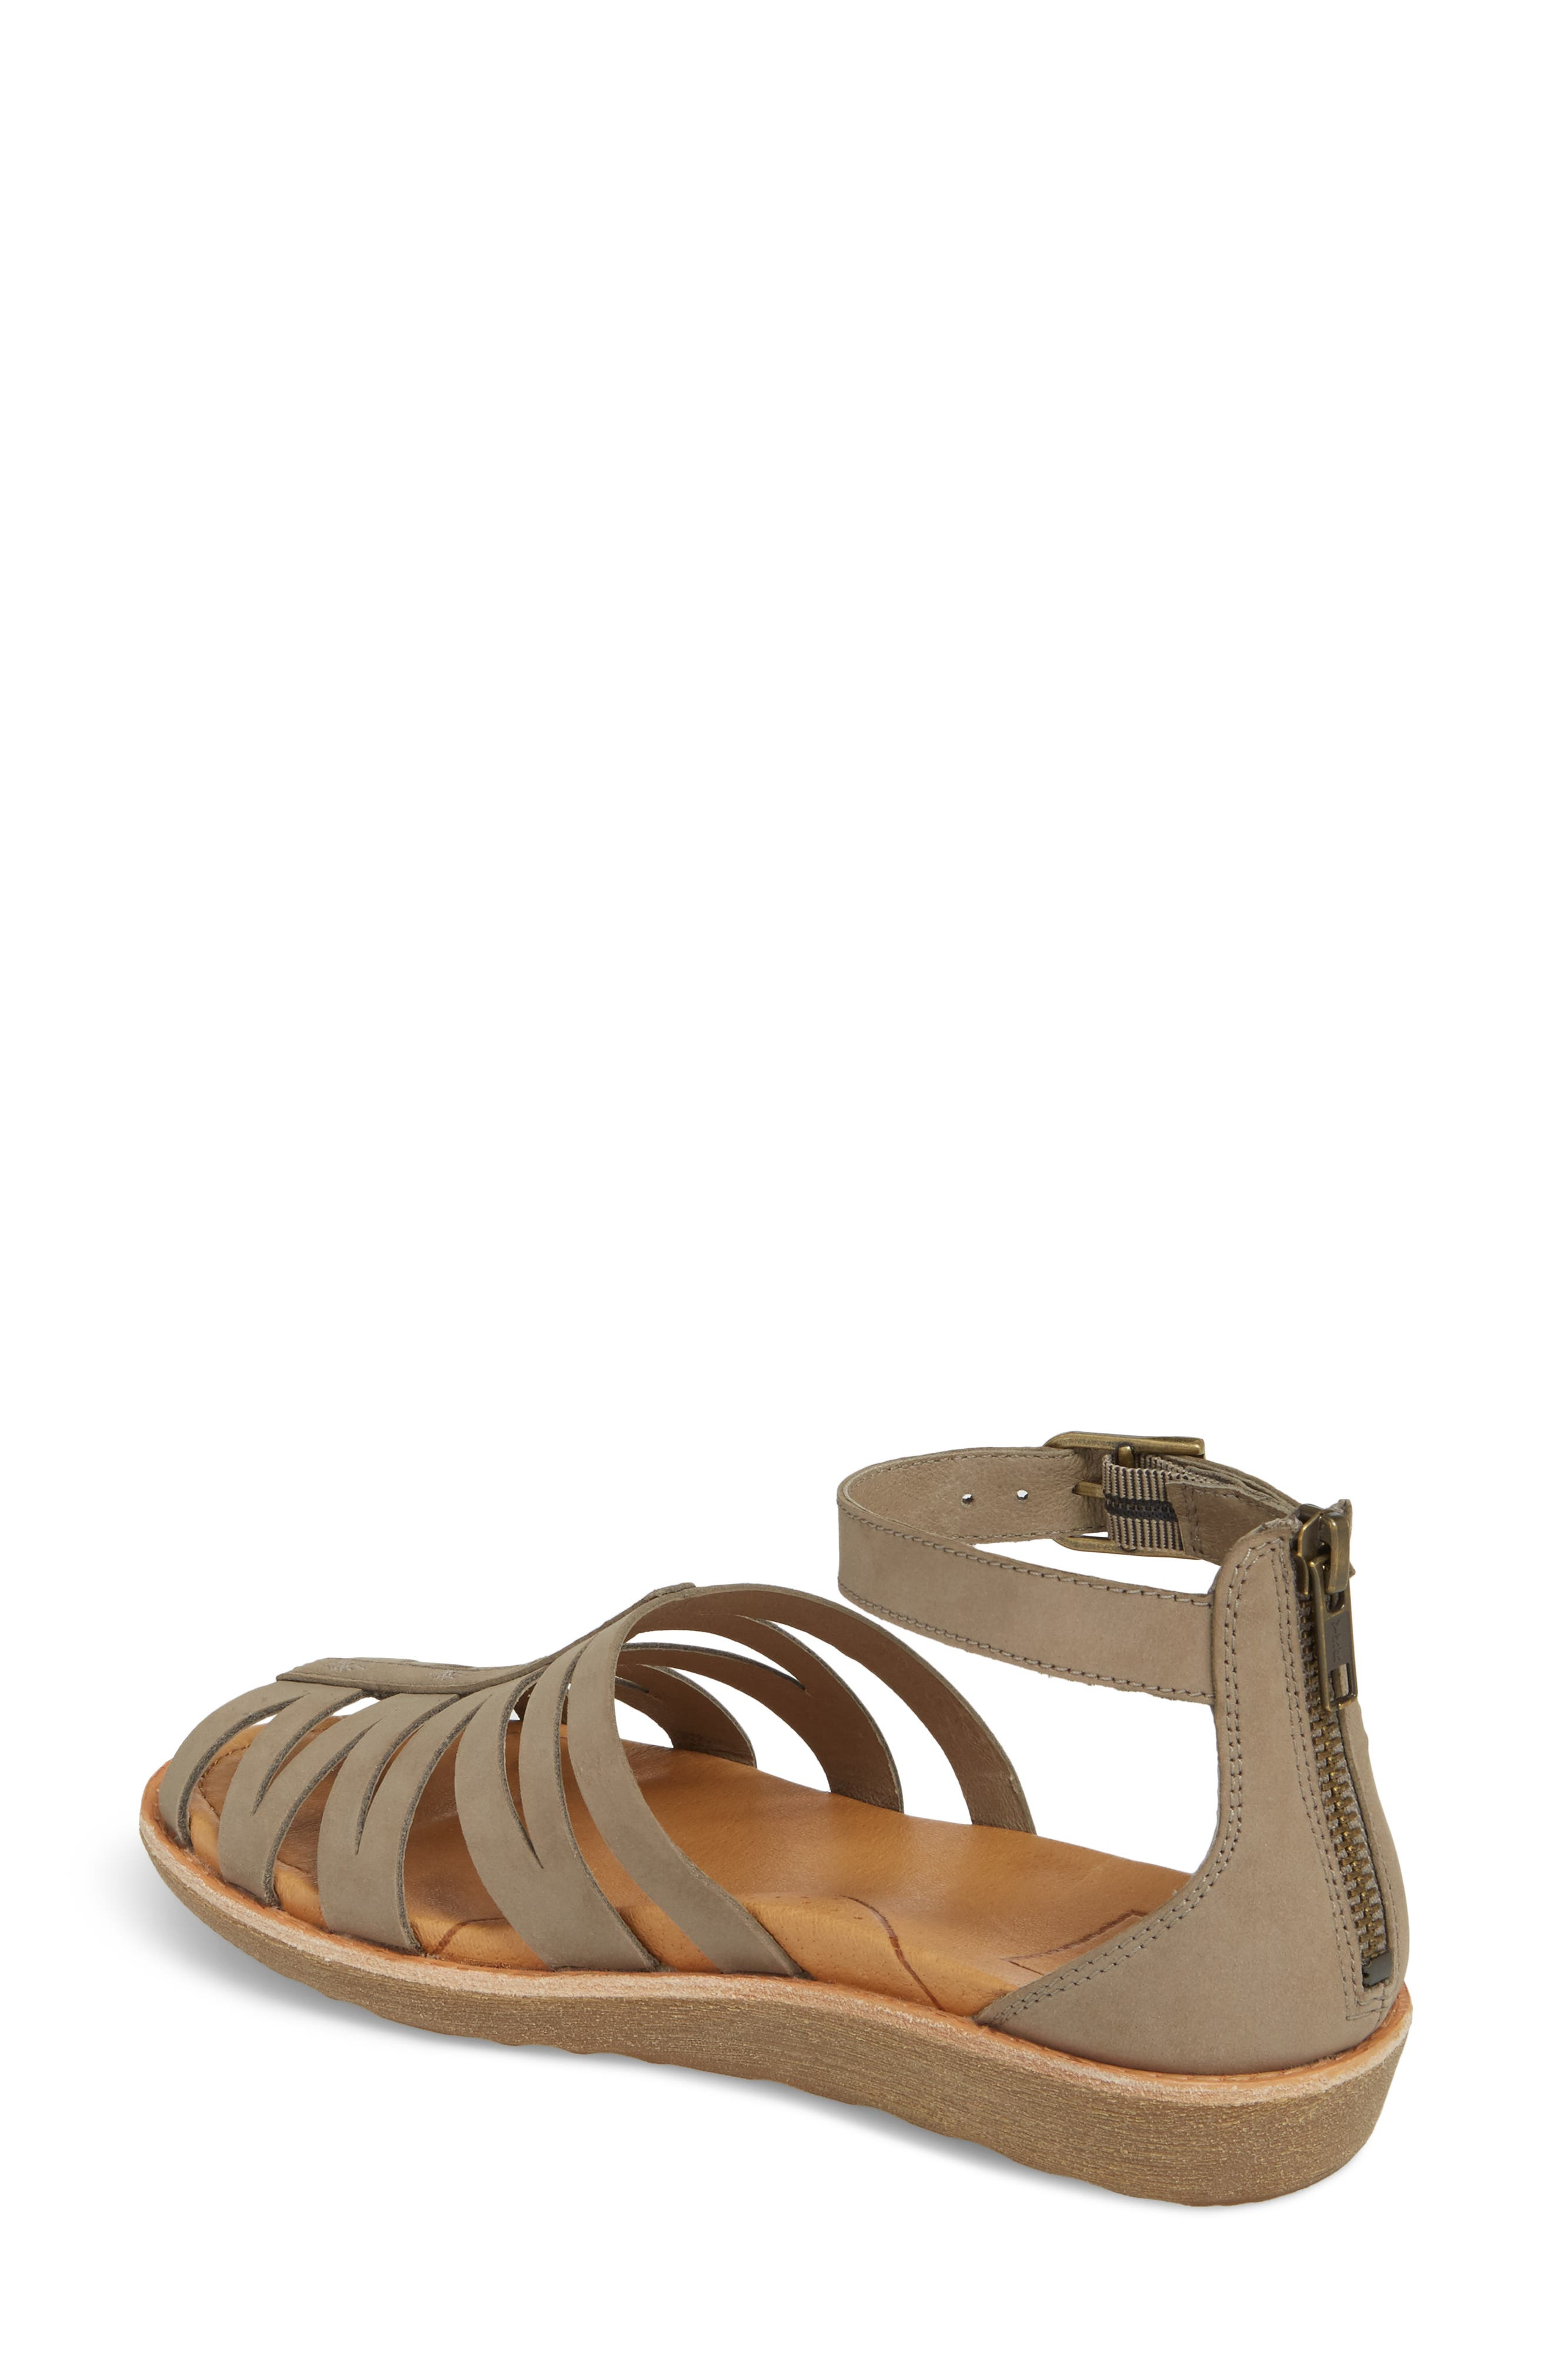 Encanta Sandal,                             Alternate thumbnail 2, color,                             Taupe Leather